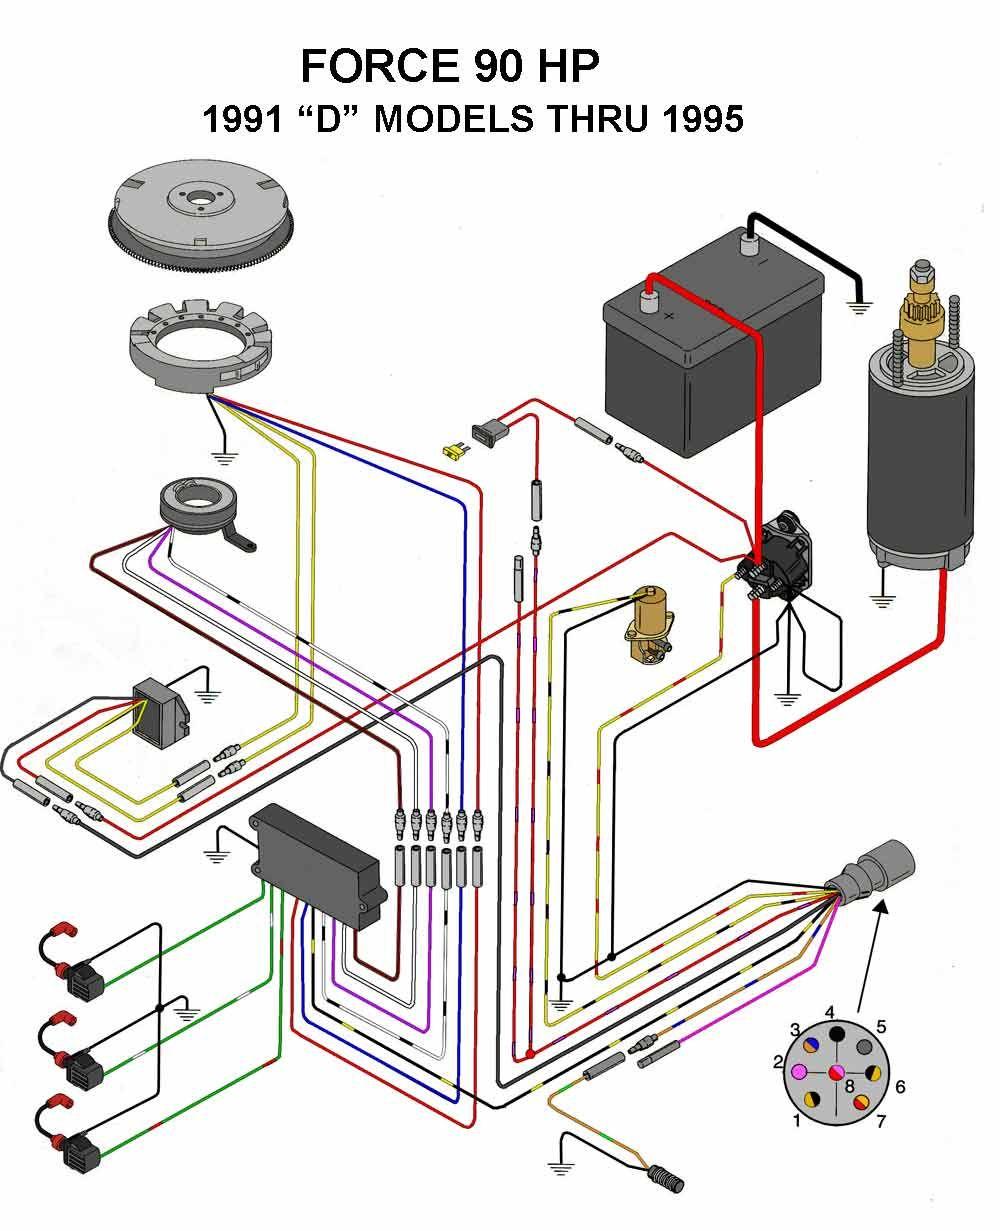 Vm 2989 System Ignition System Engine Wiring Engine Wiring Engine Wiring Wiring Diagram